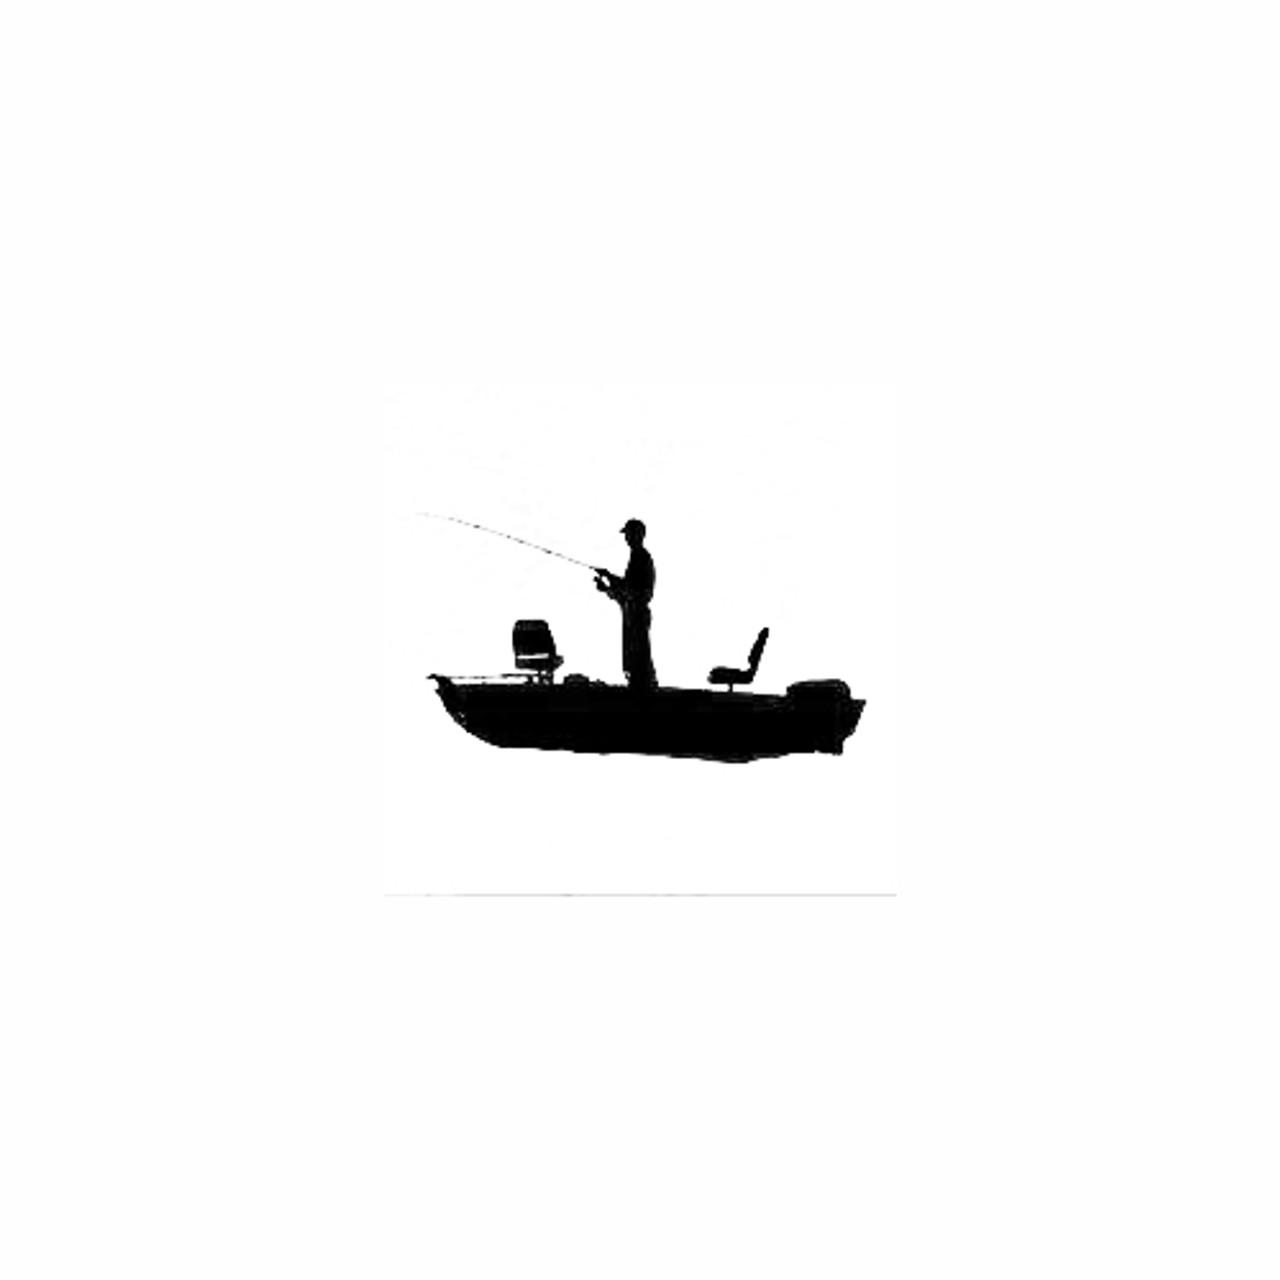 Man Boat Fishing Silhouette Vinyl Decal